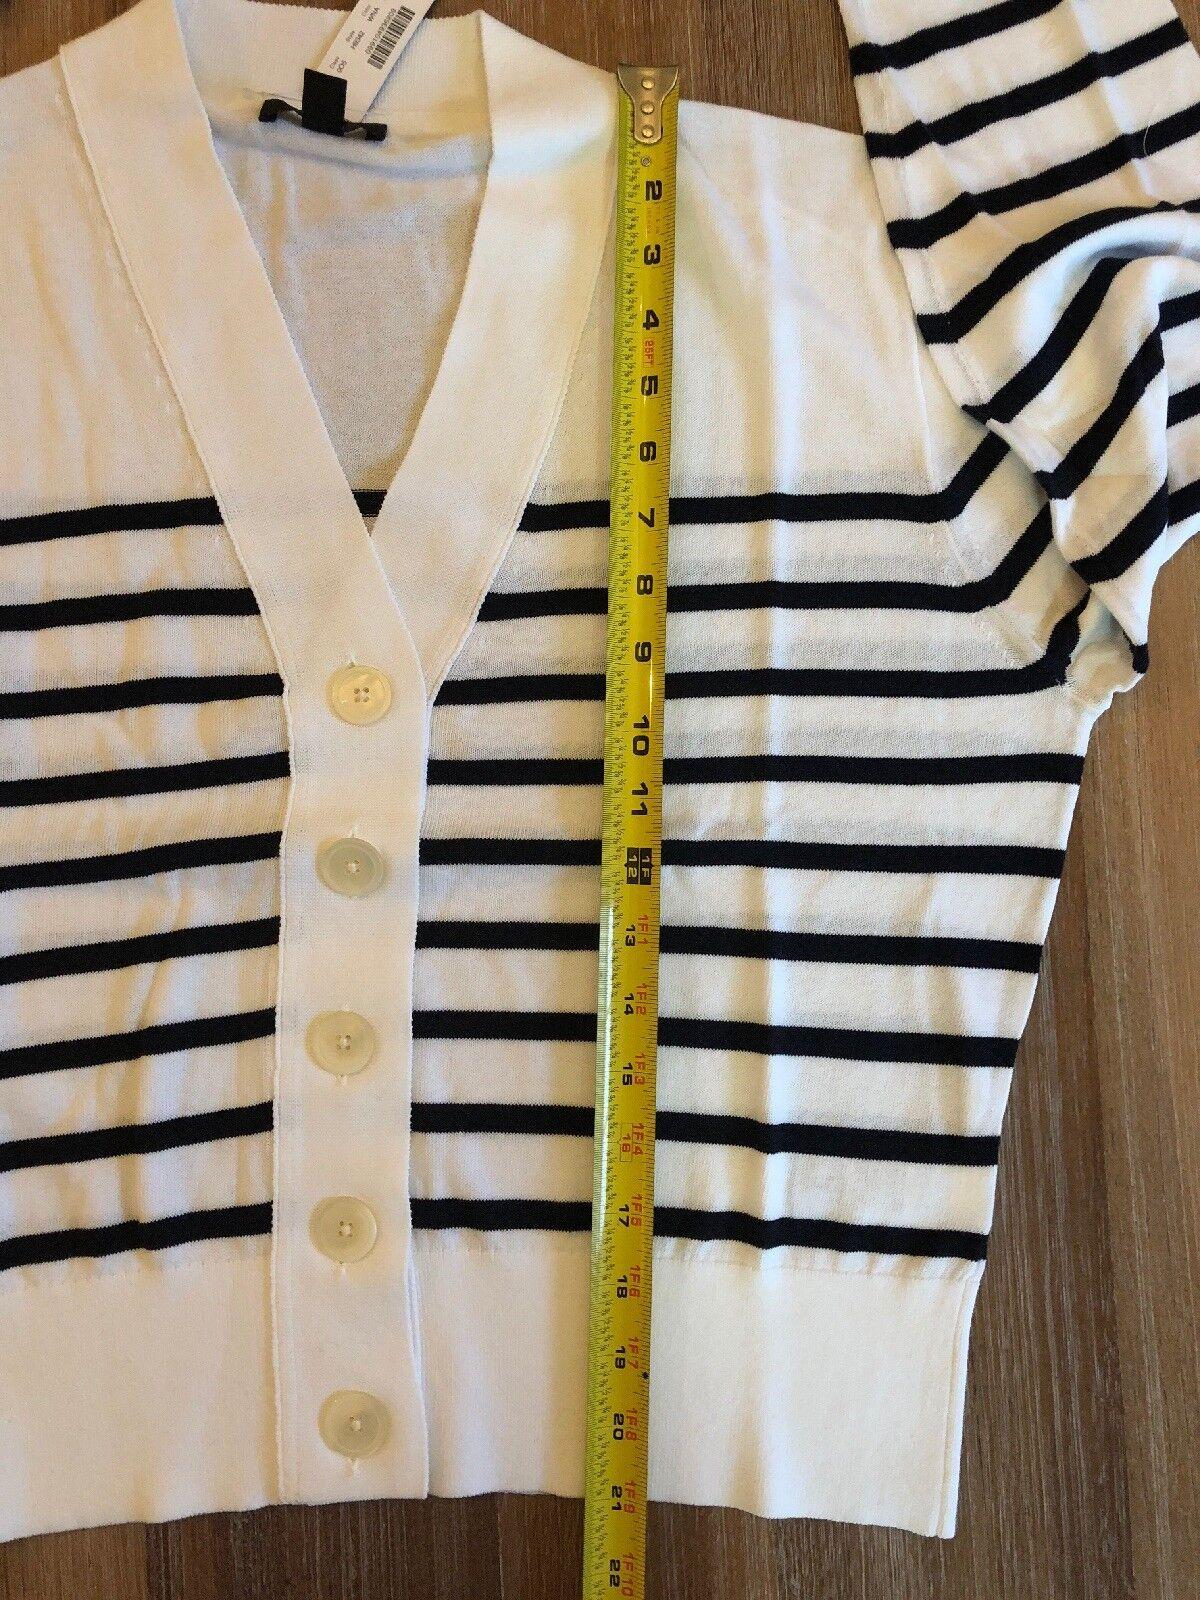 NWT J Crew Women's Cropped Lightweight Lightweight Lightweight Cardigan Sweater White & Navy Stripe - XL 355215